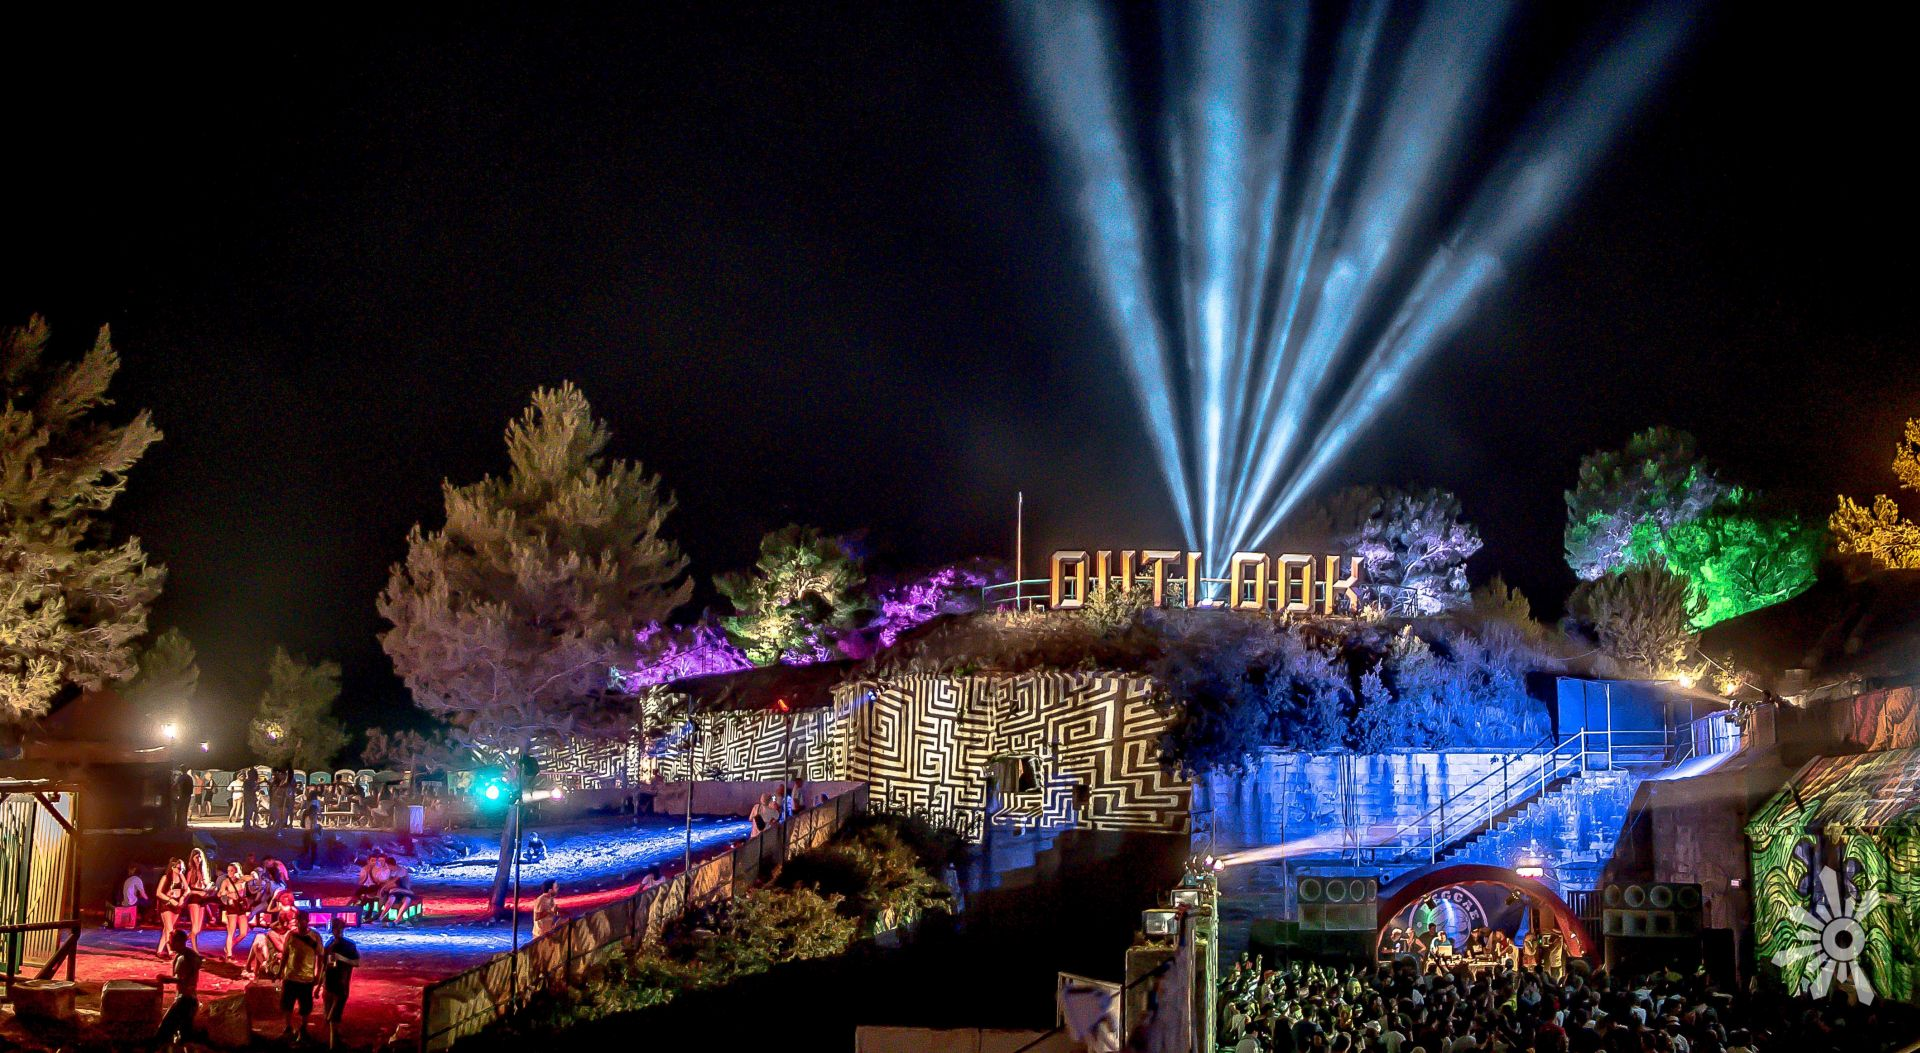 Dizzee Rascal i DJ Shadow otvaraju 10. Outlook festival